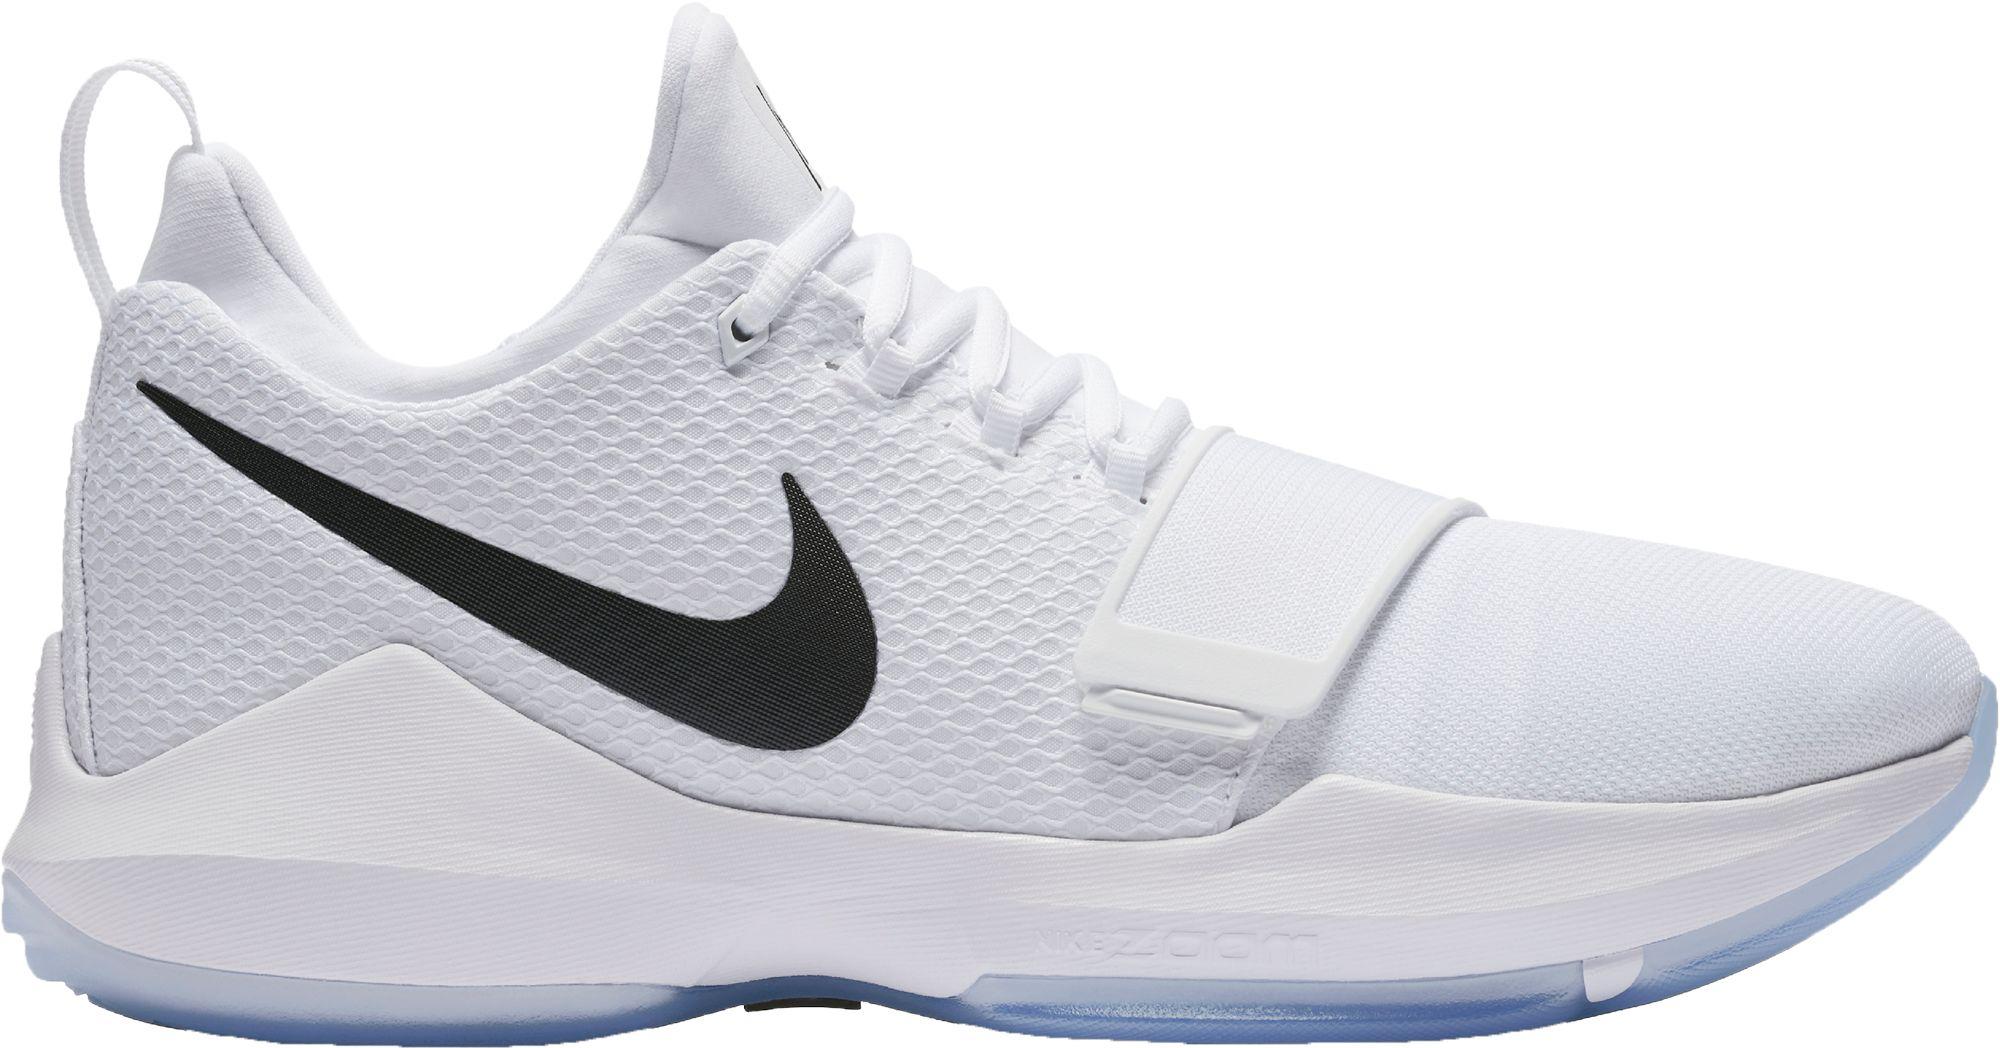 Nike Men's PG 1 Basketball Shoes